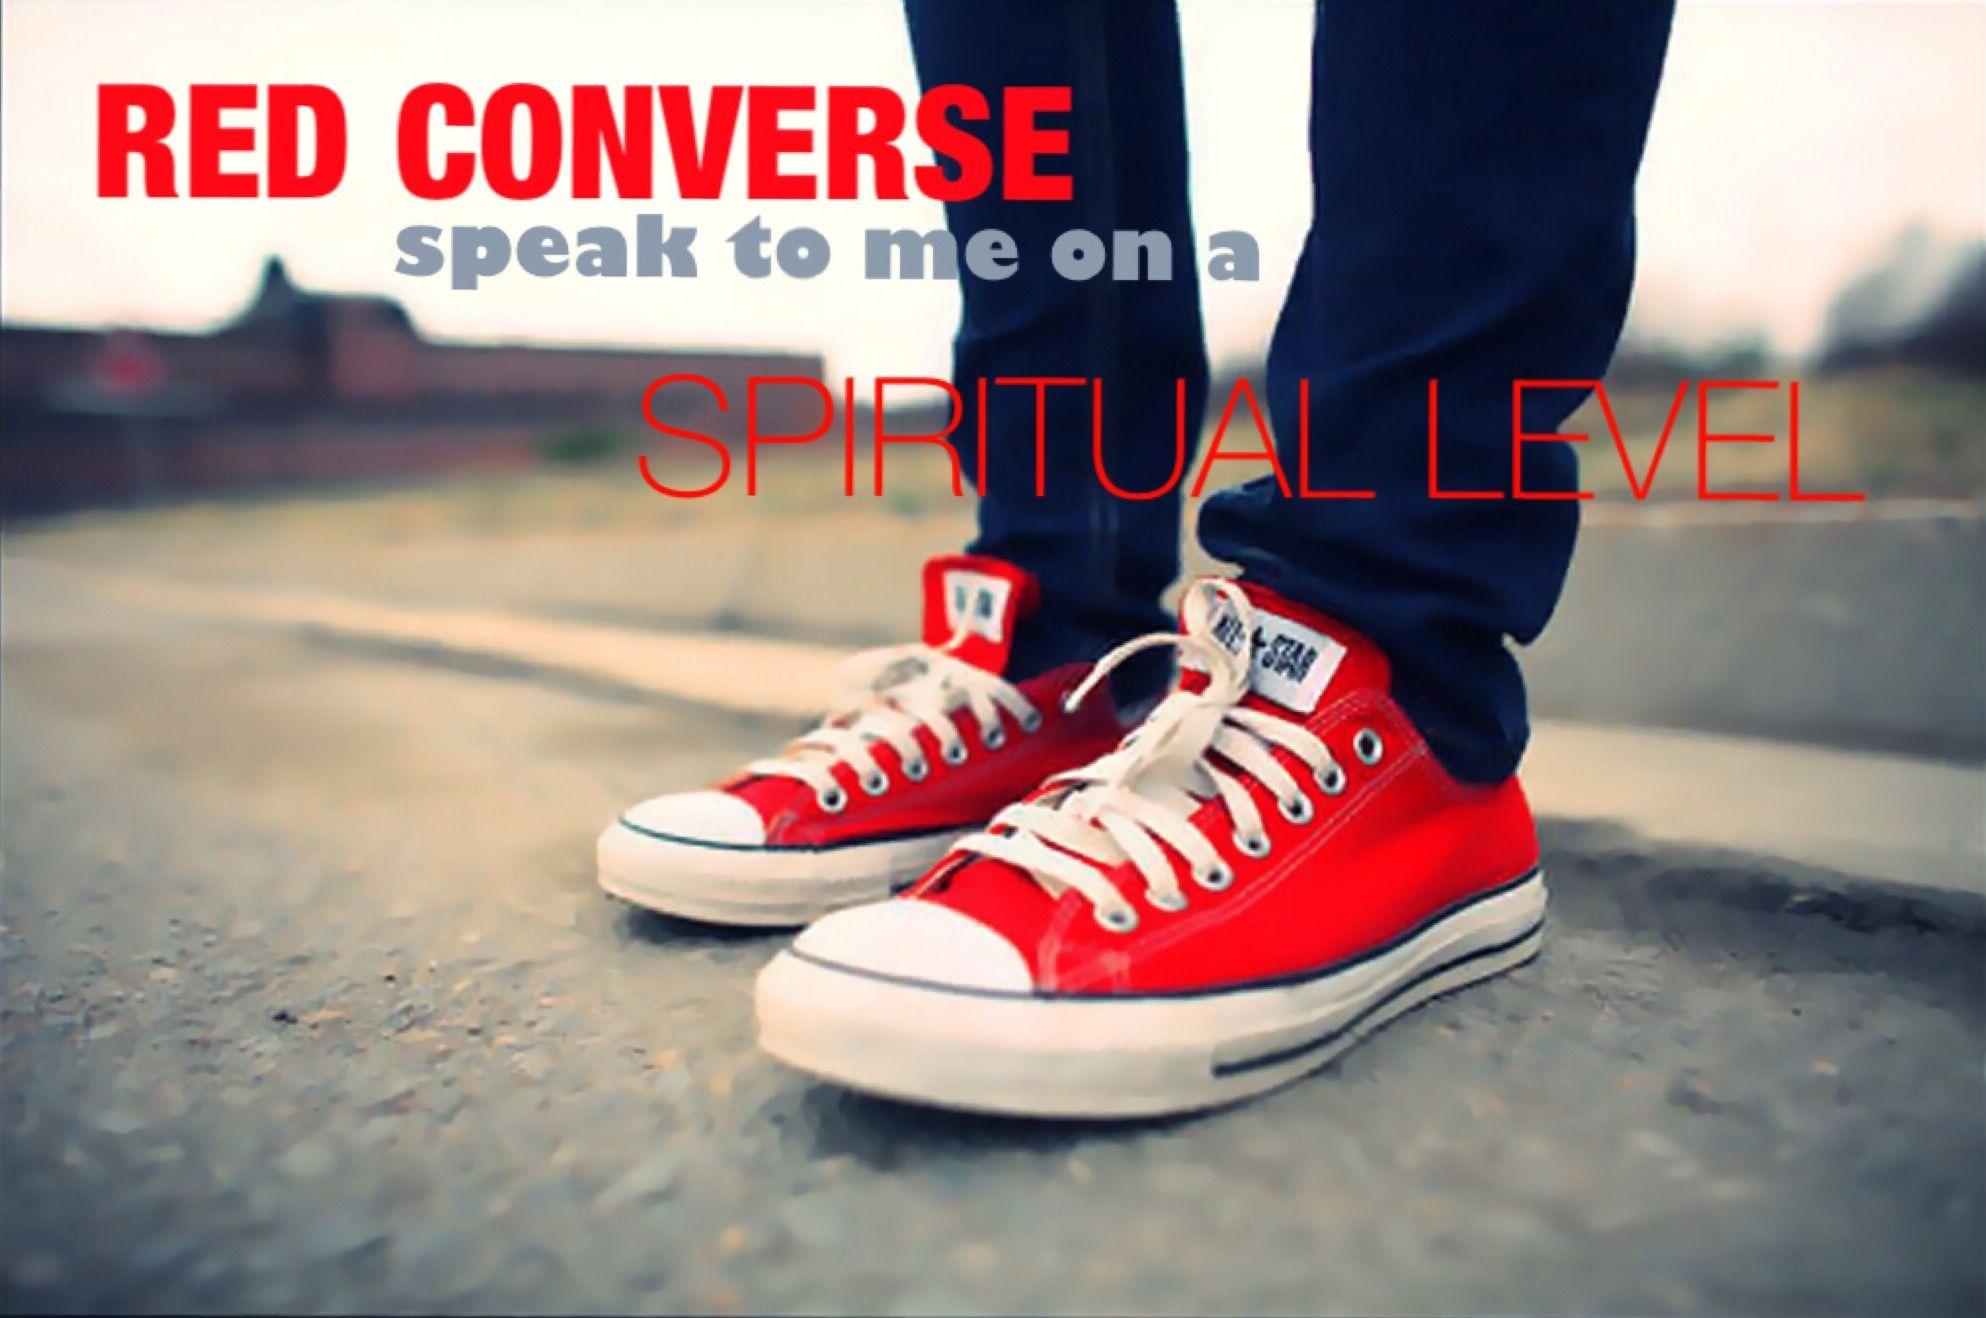 redconverse red converse | Converse